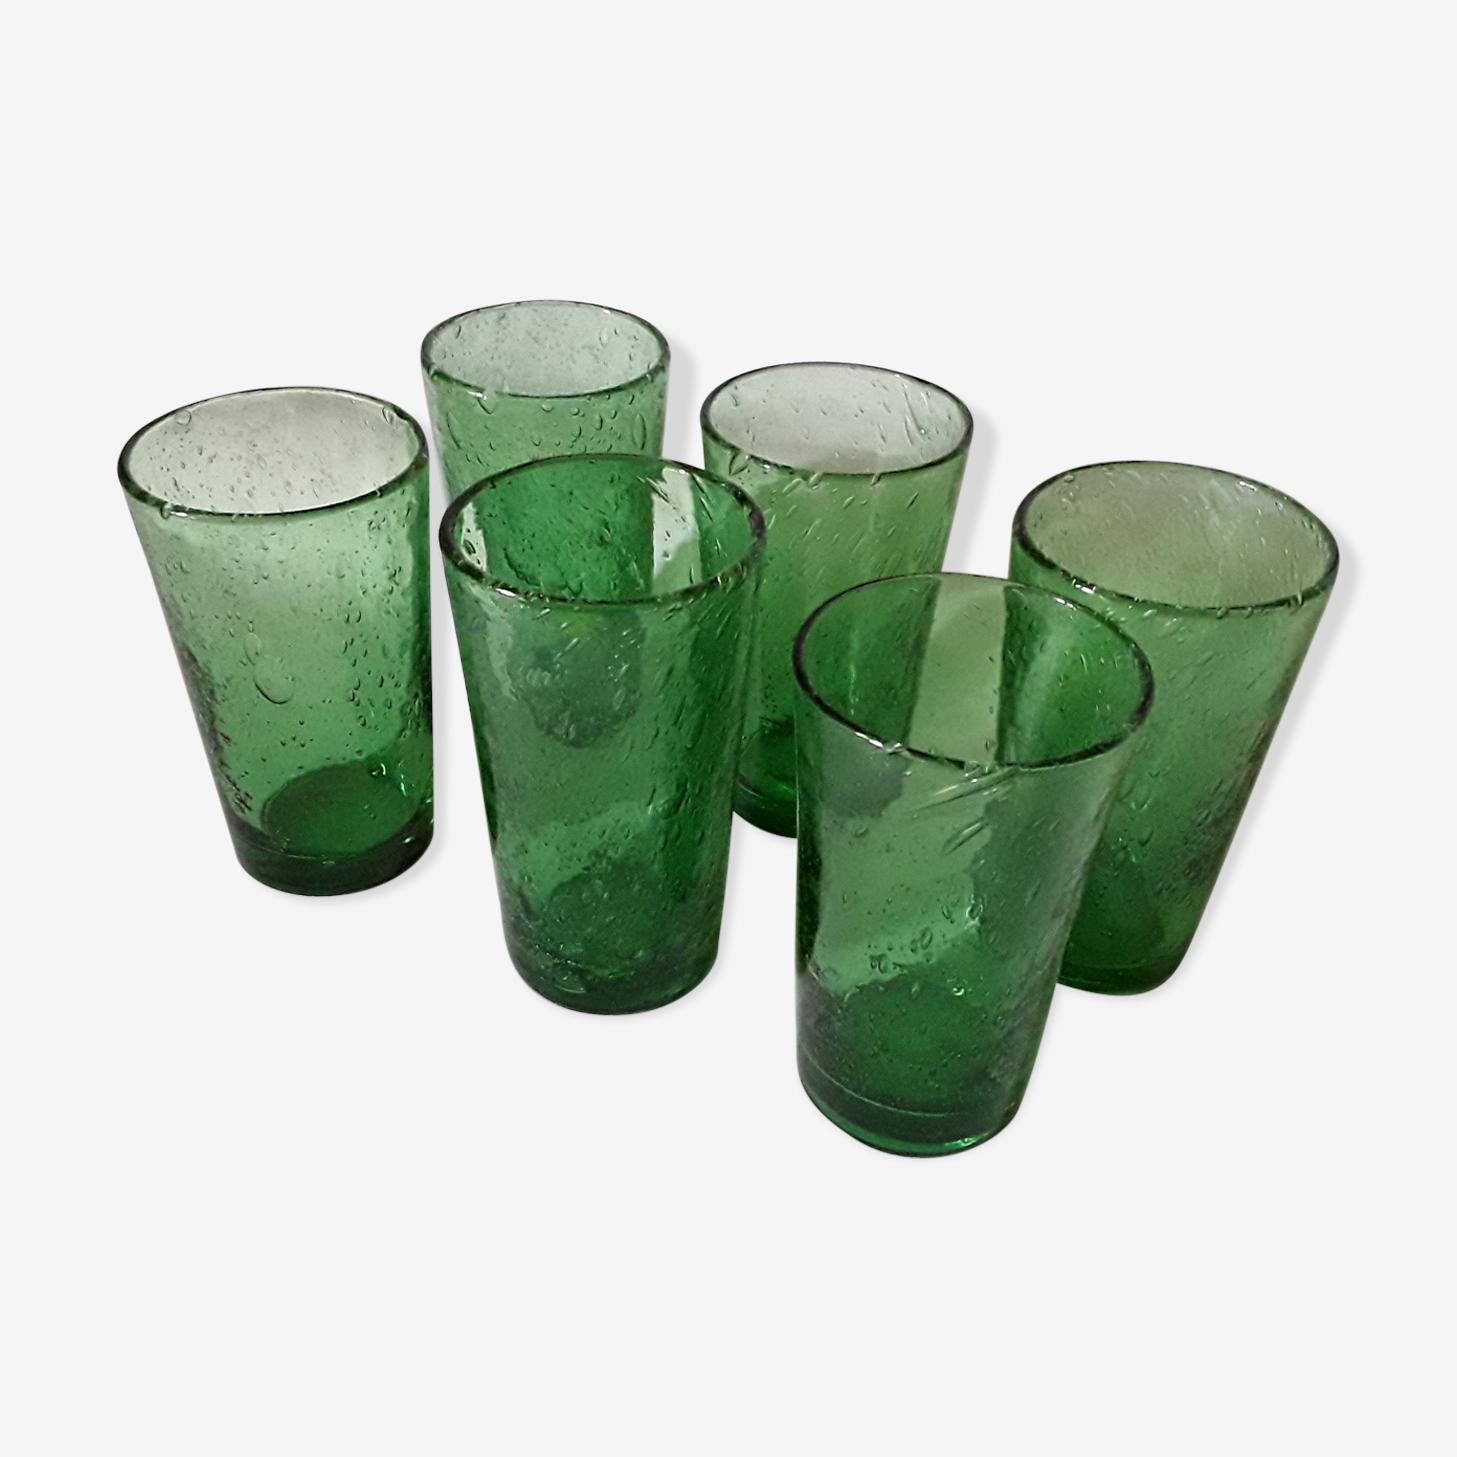 6 glasses of biot